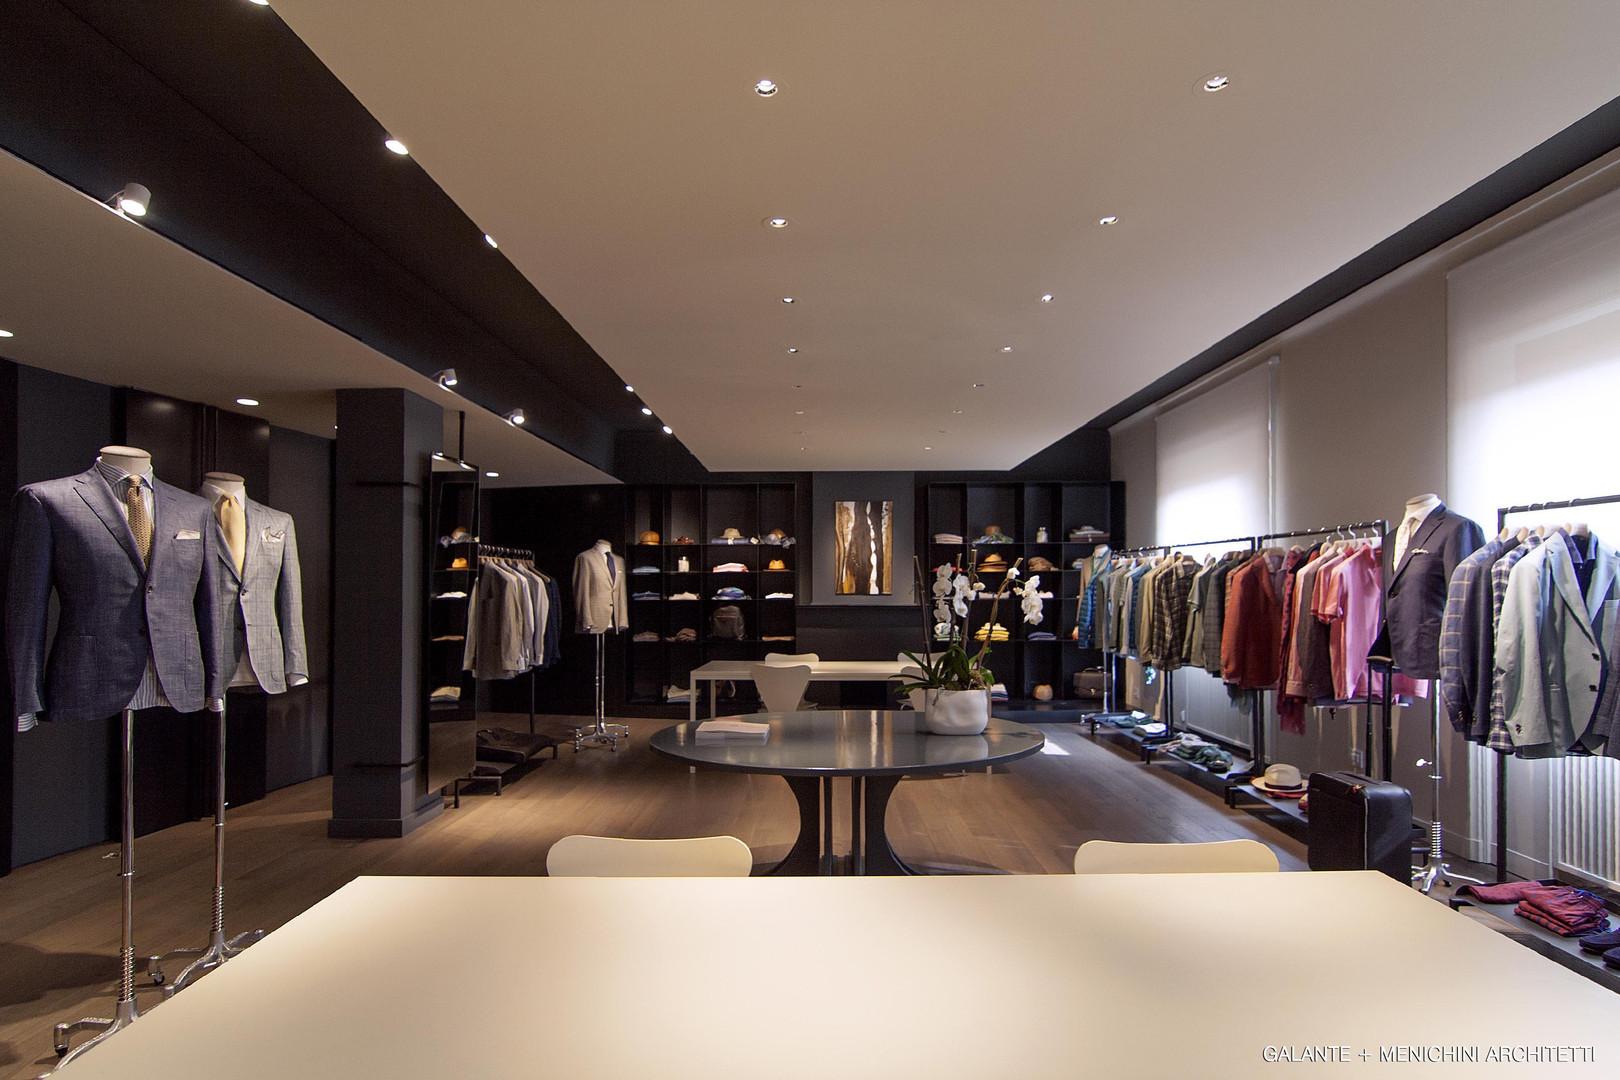 LB_showroom_02_LOW.jpg